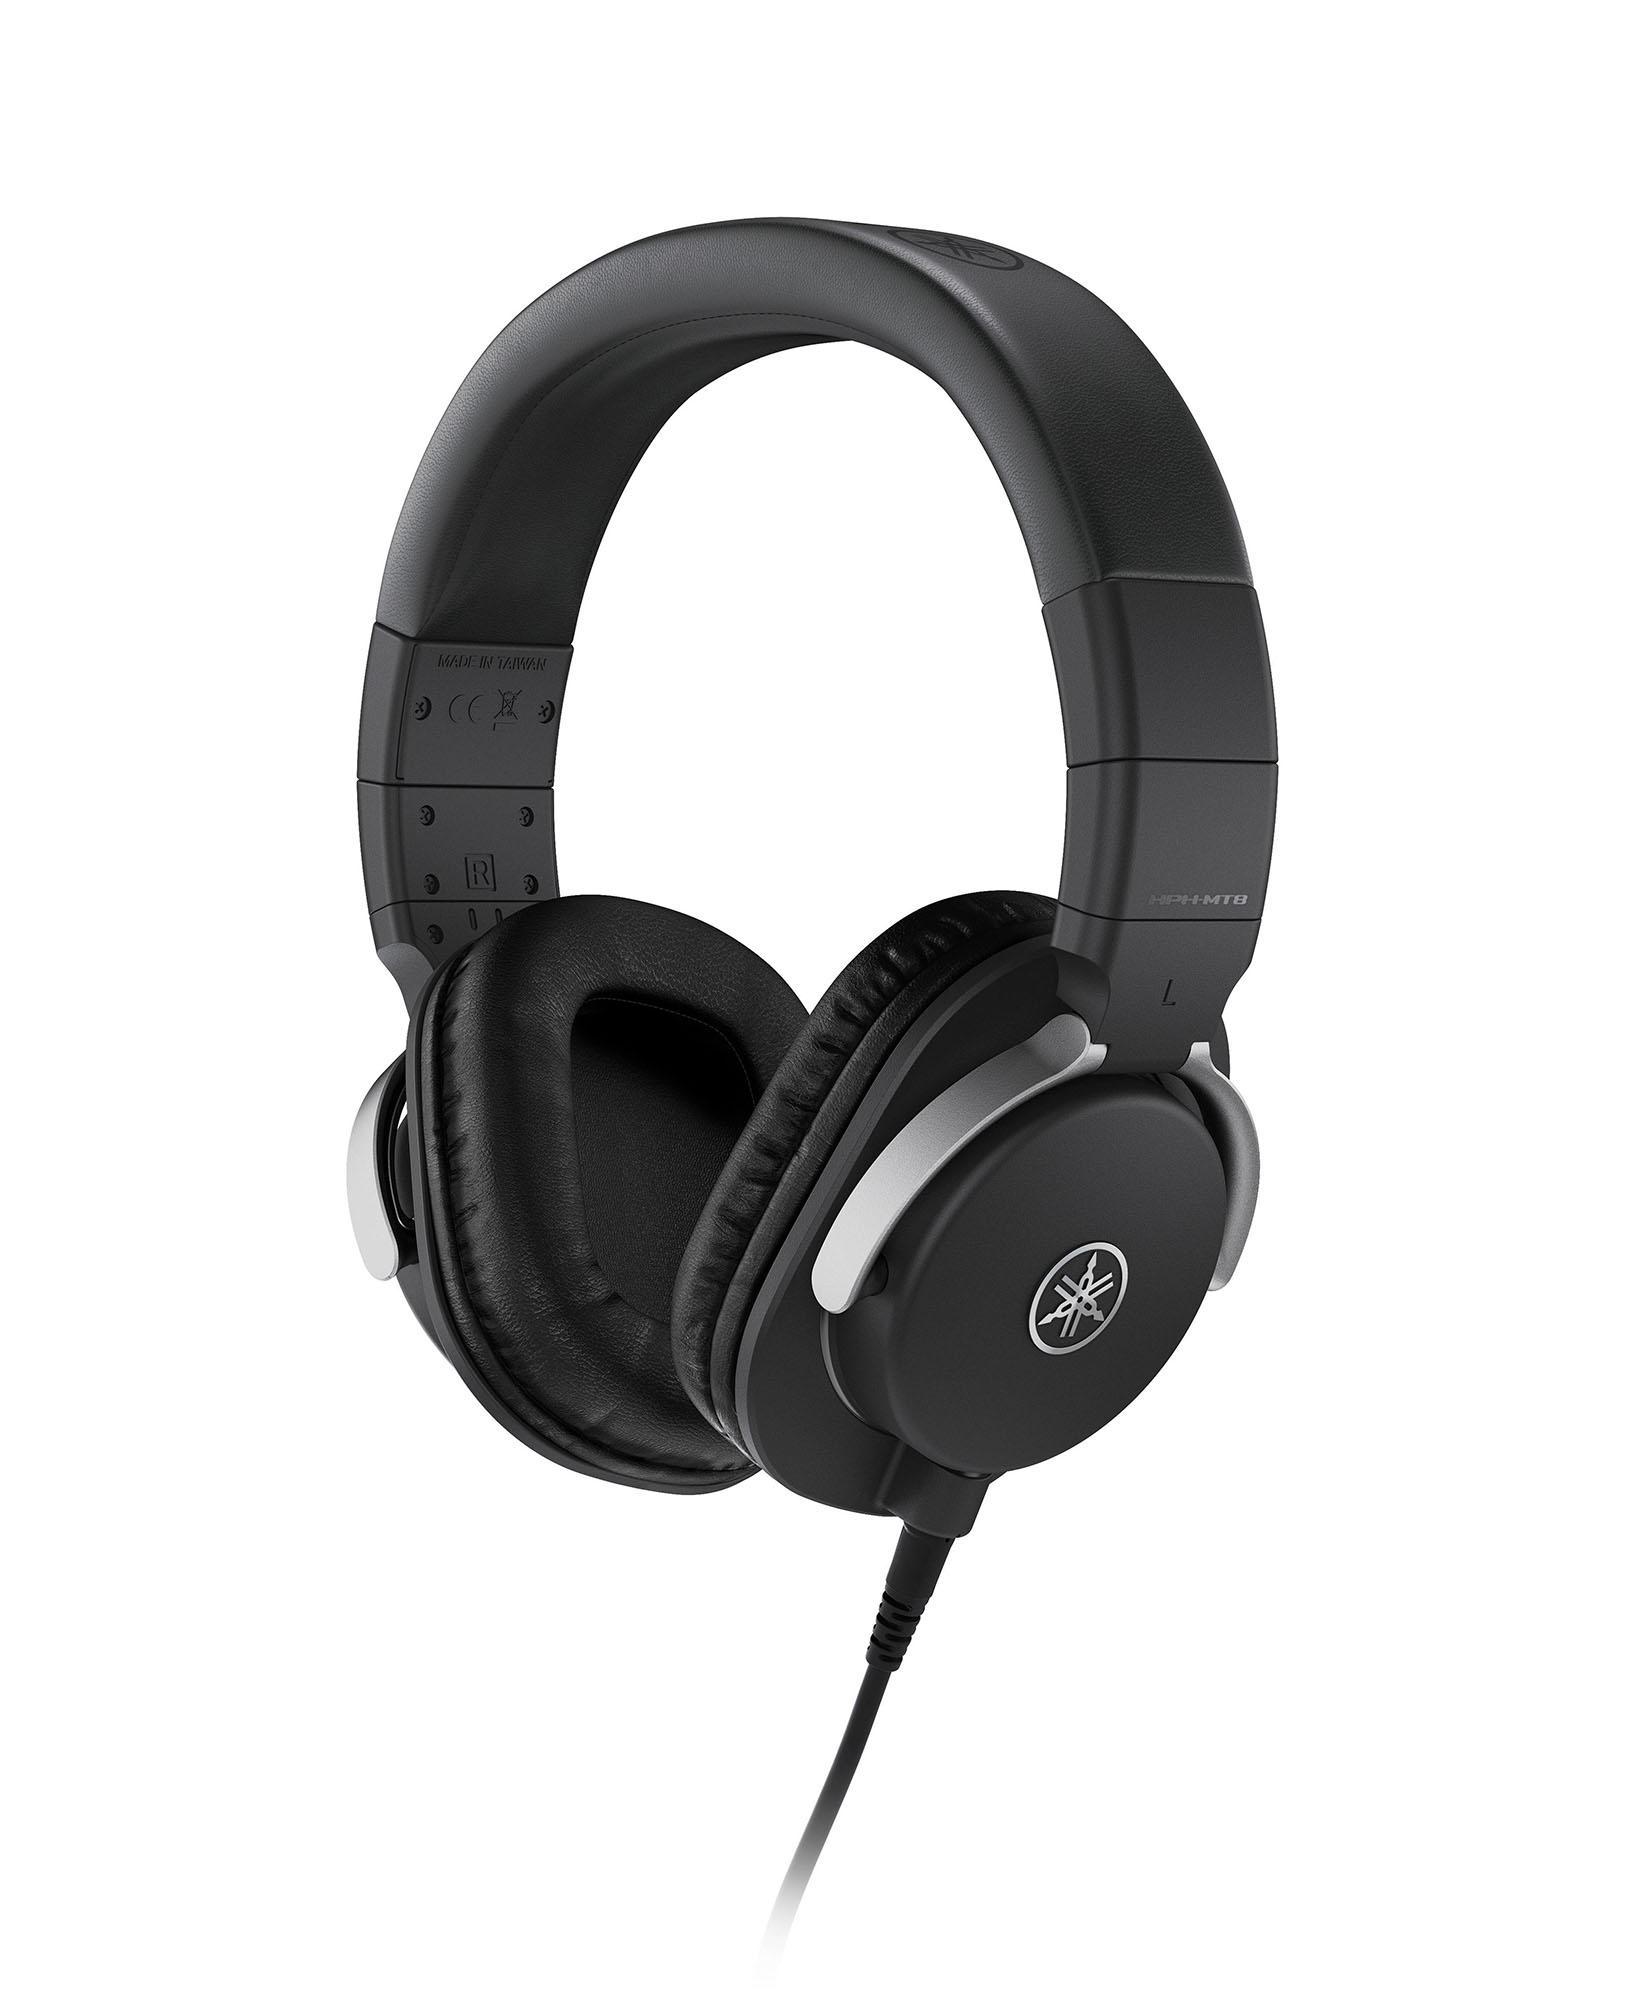 yamaha-hph-mt8-studio-monitor-headphones.jpg